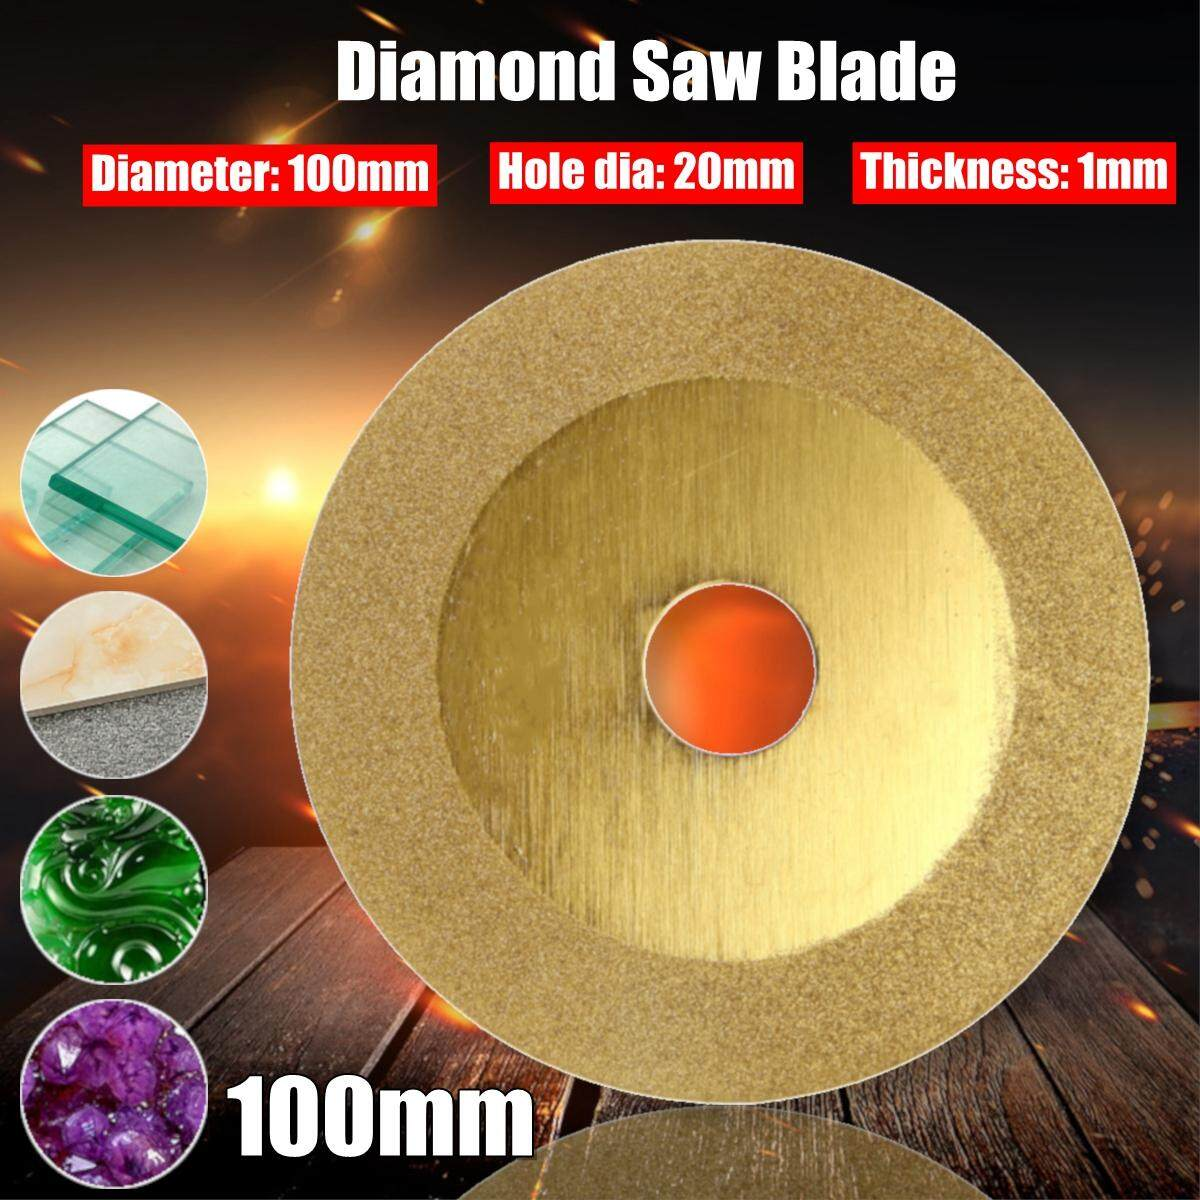 20mm Hole Mini 100mm Diameter Diamond Saw Blade Disc Cutting Wheel for Angle Grinder Cutting Glass Ceramic Granite